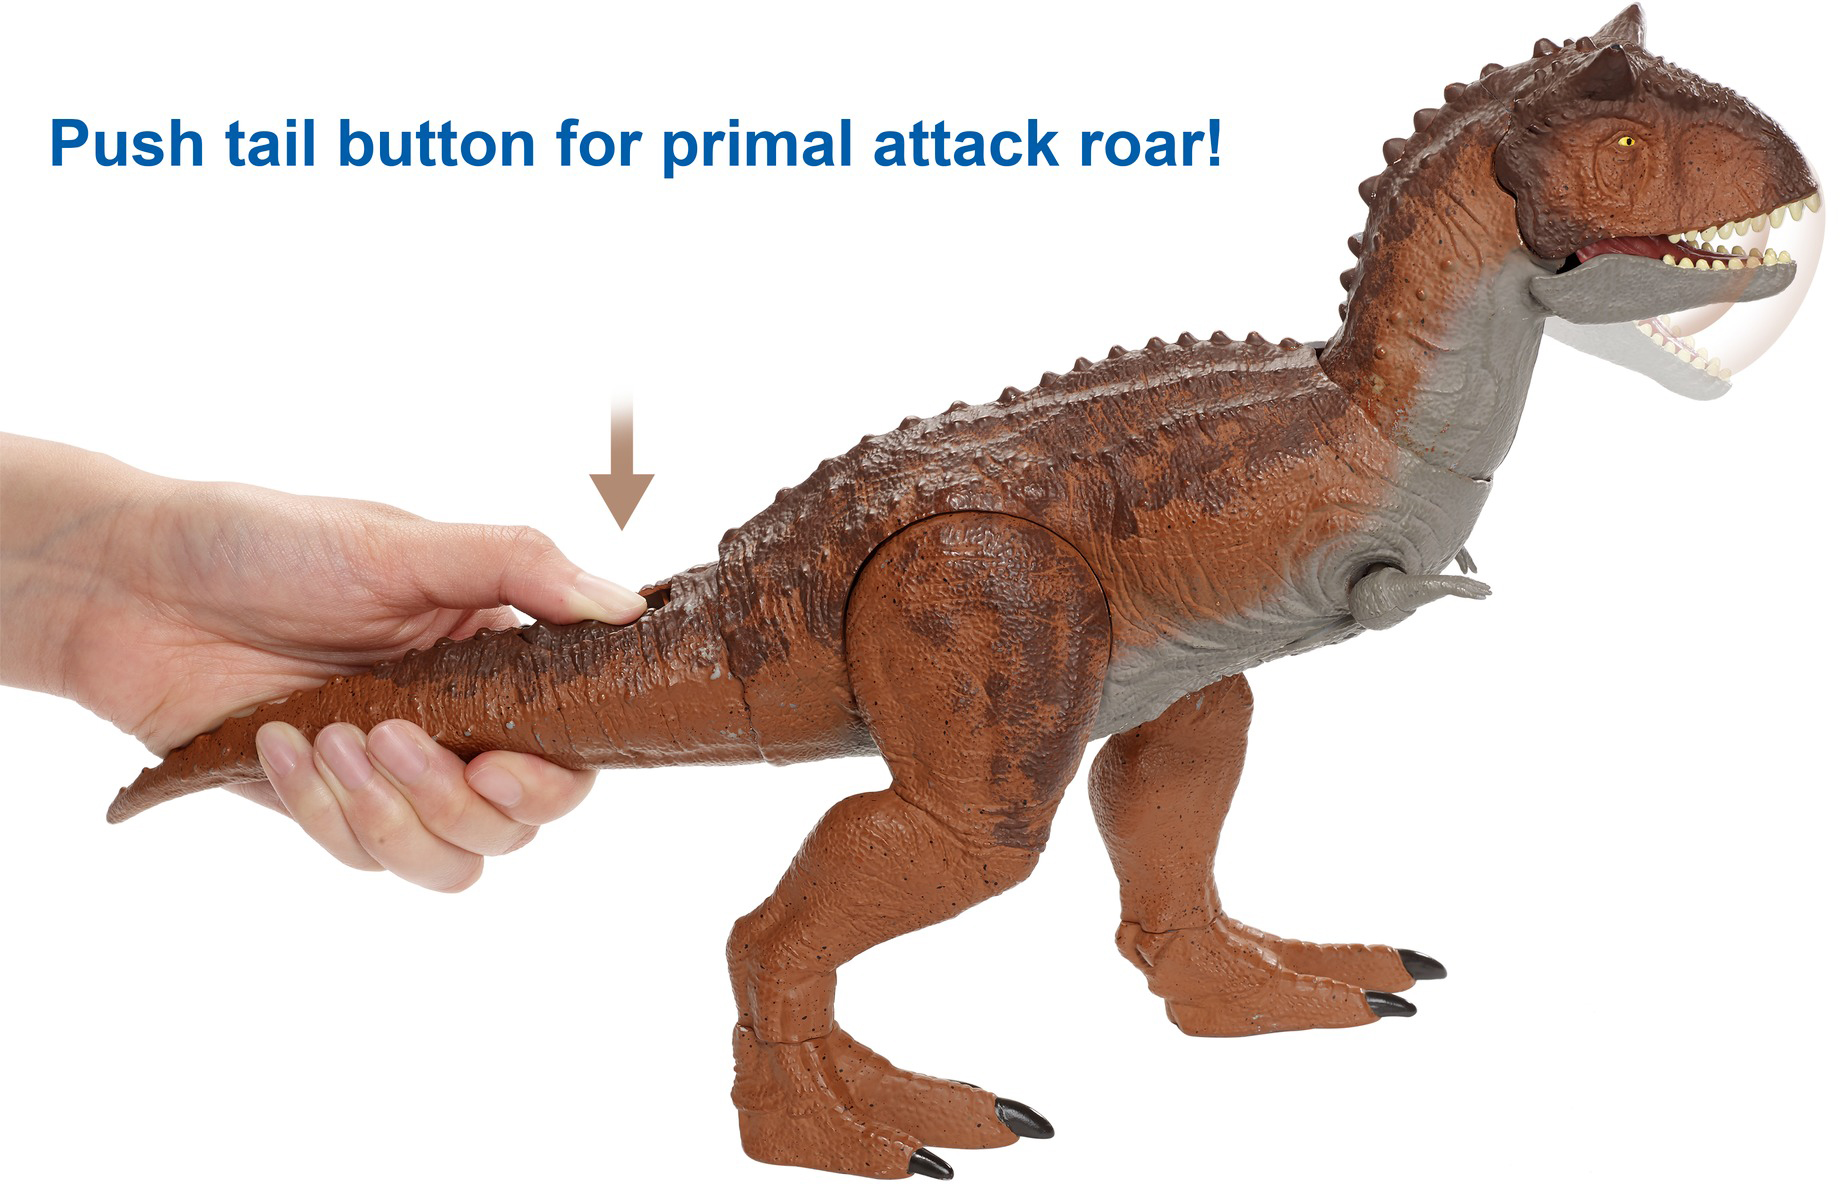 Jurassic World Primal attaque contrôle /'N conquérir Carnotaurus 2020 NOUVELLE VERSION!